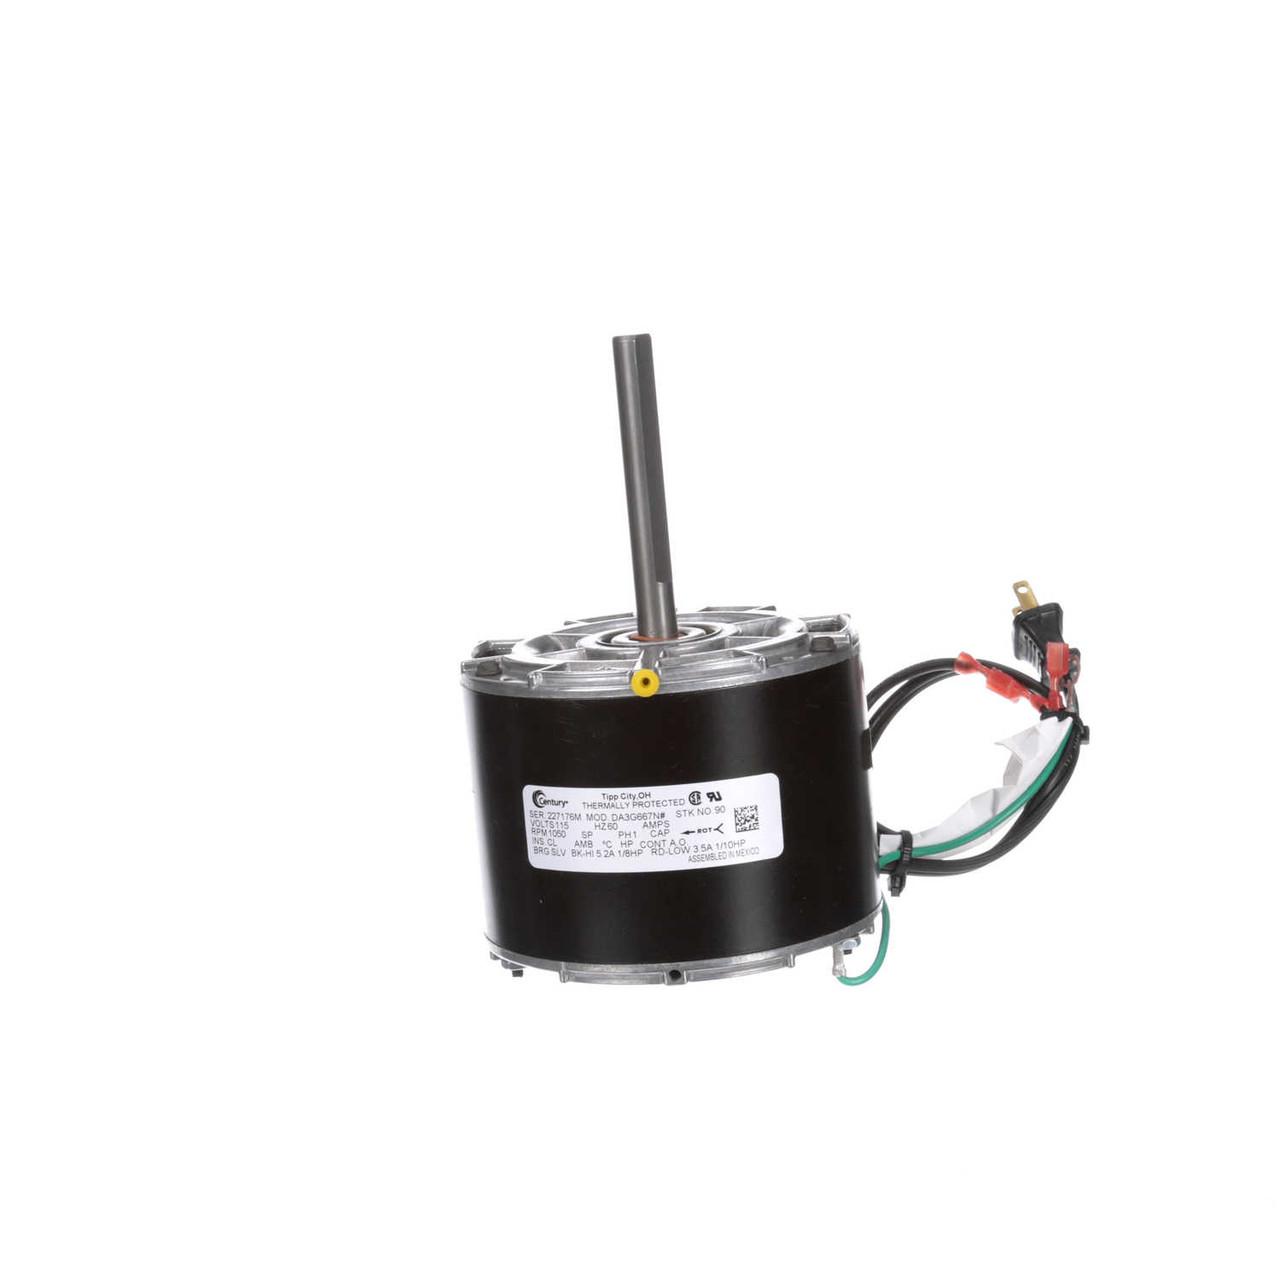 Intertherm Furnace Motor 1/12 hp 1050 RPM 2-Speed 115V